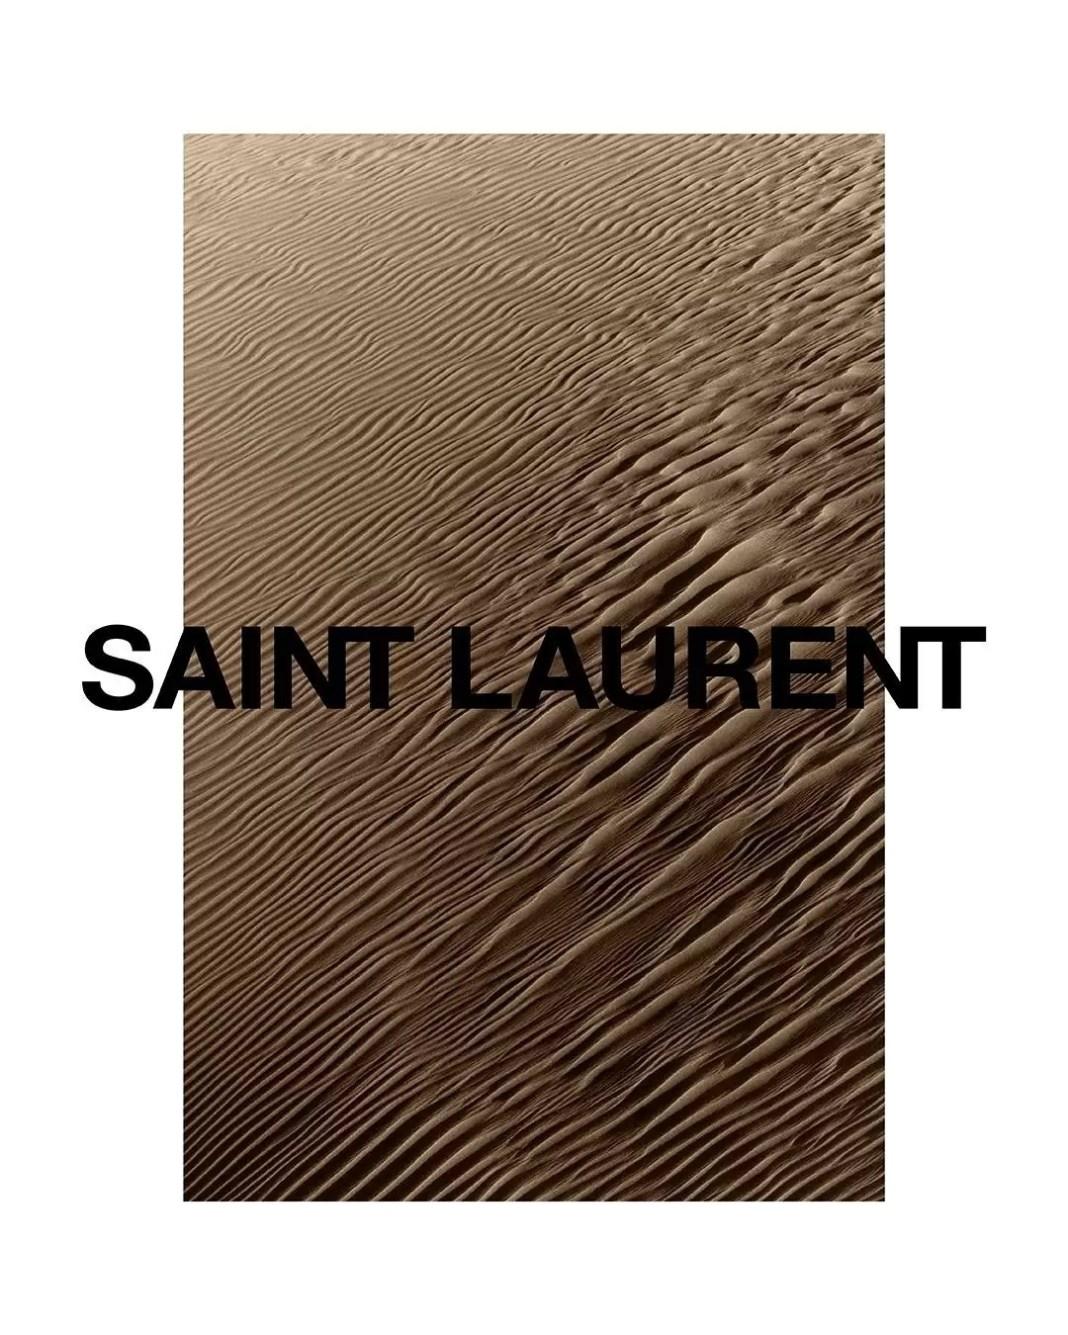 Saint Laurent's Summer21